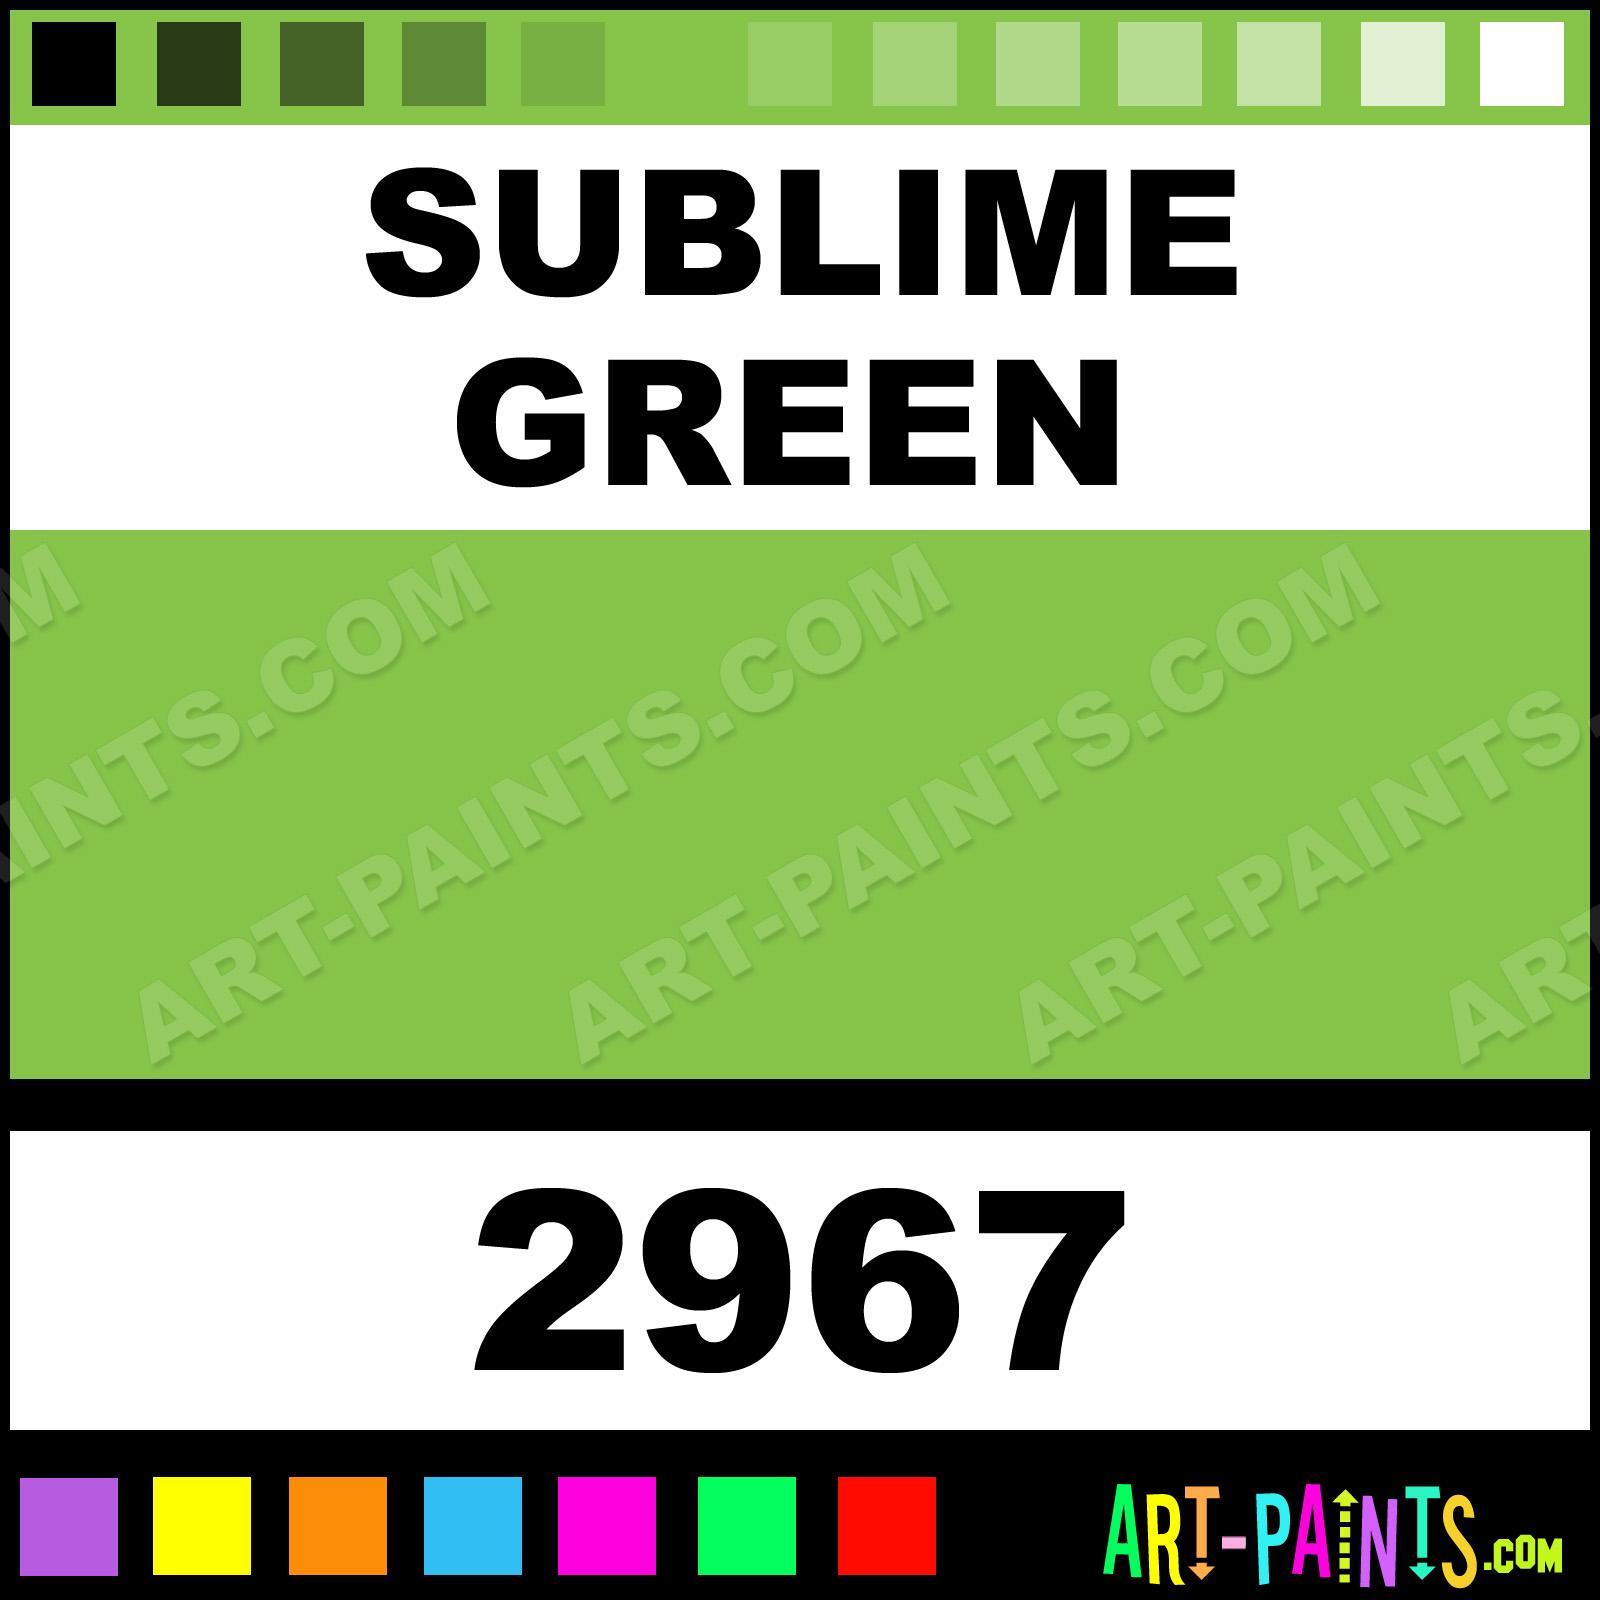 Green car paint colors - Sublime Green Sublime Green Paint